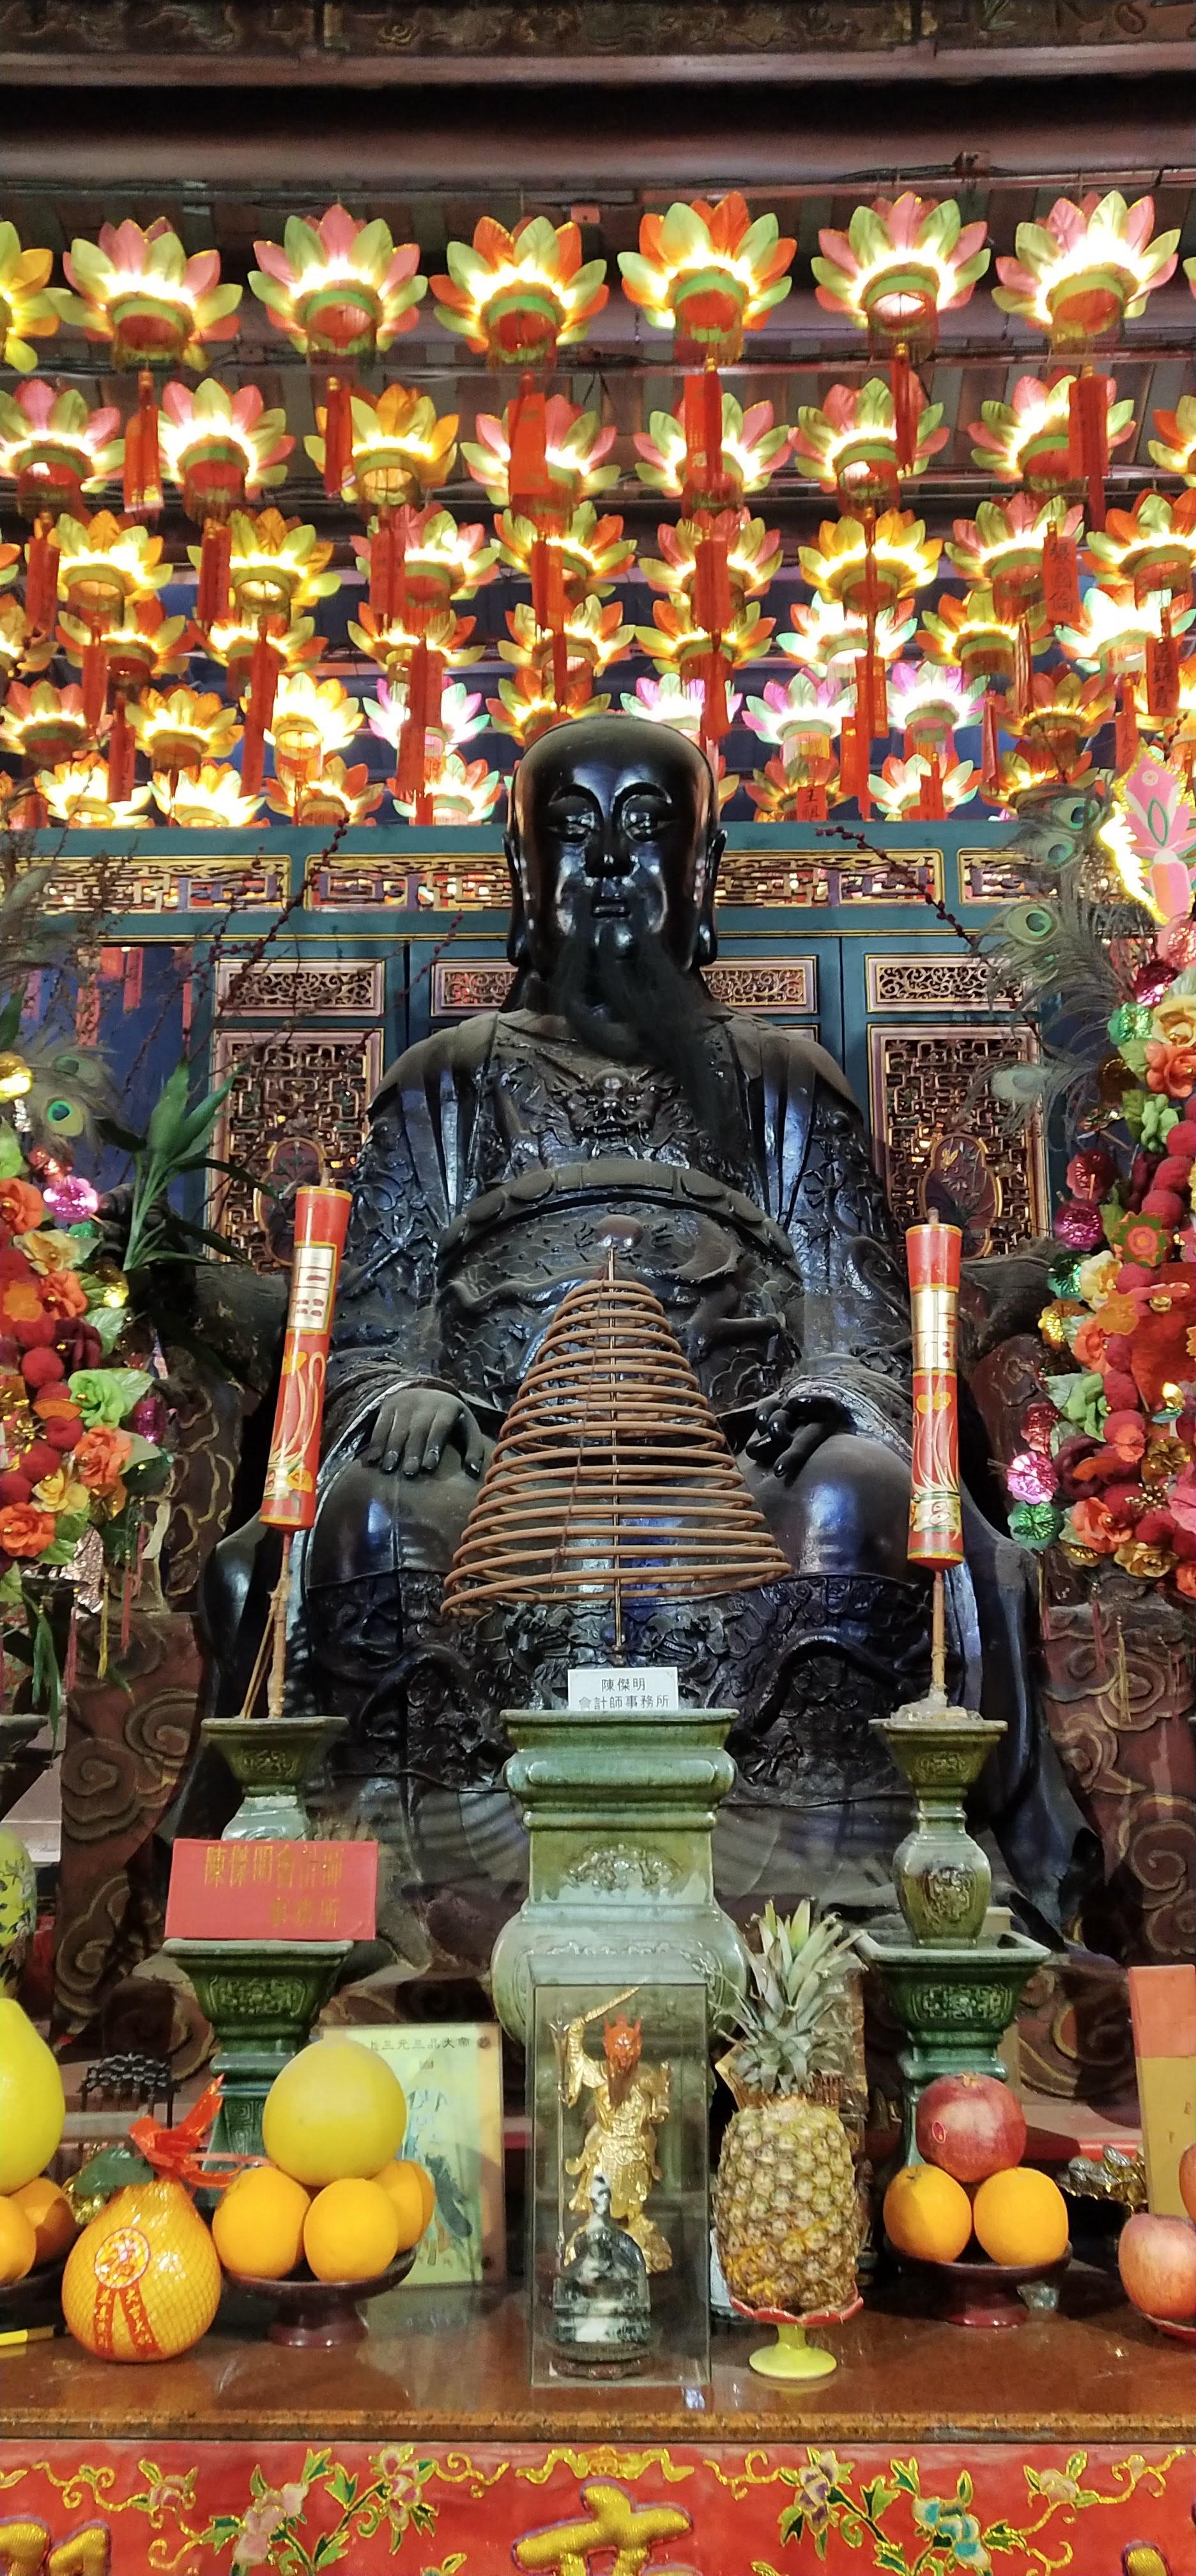 The large Pak Tai Statue